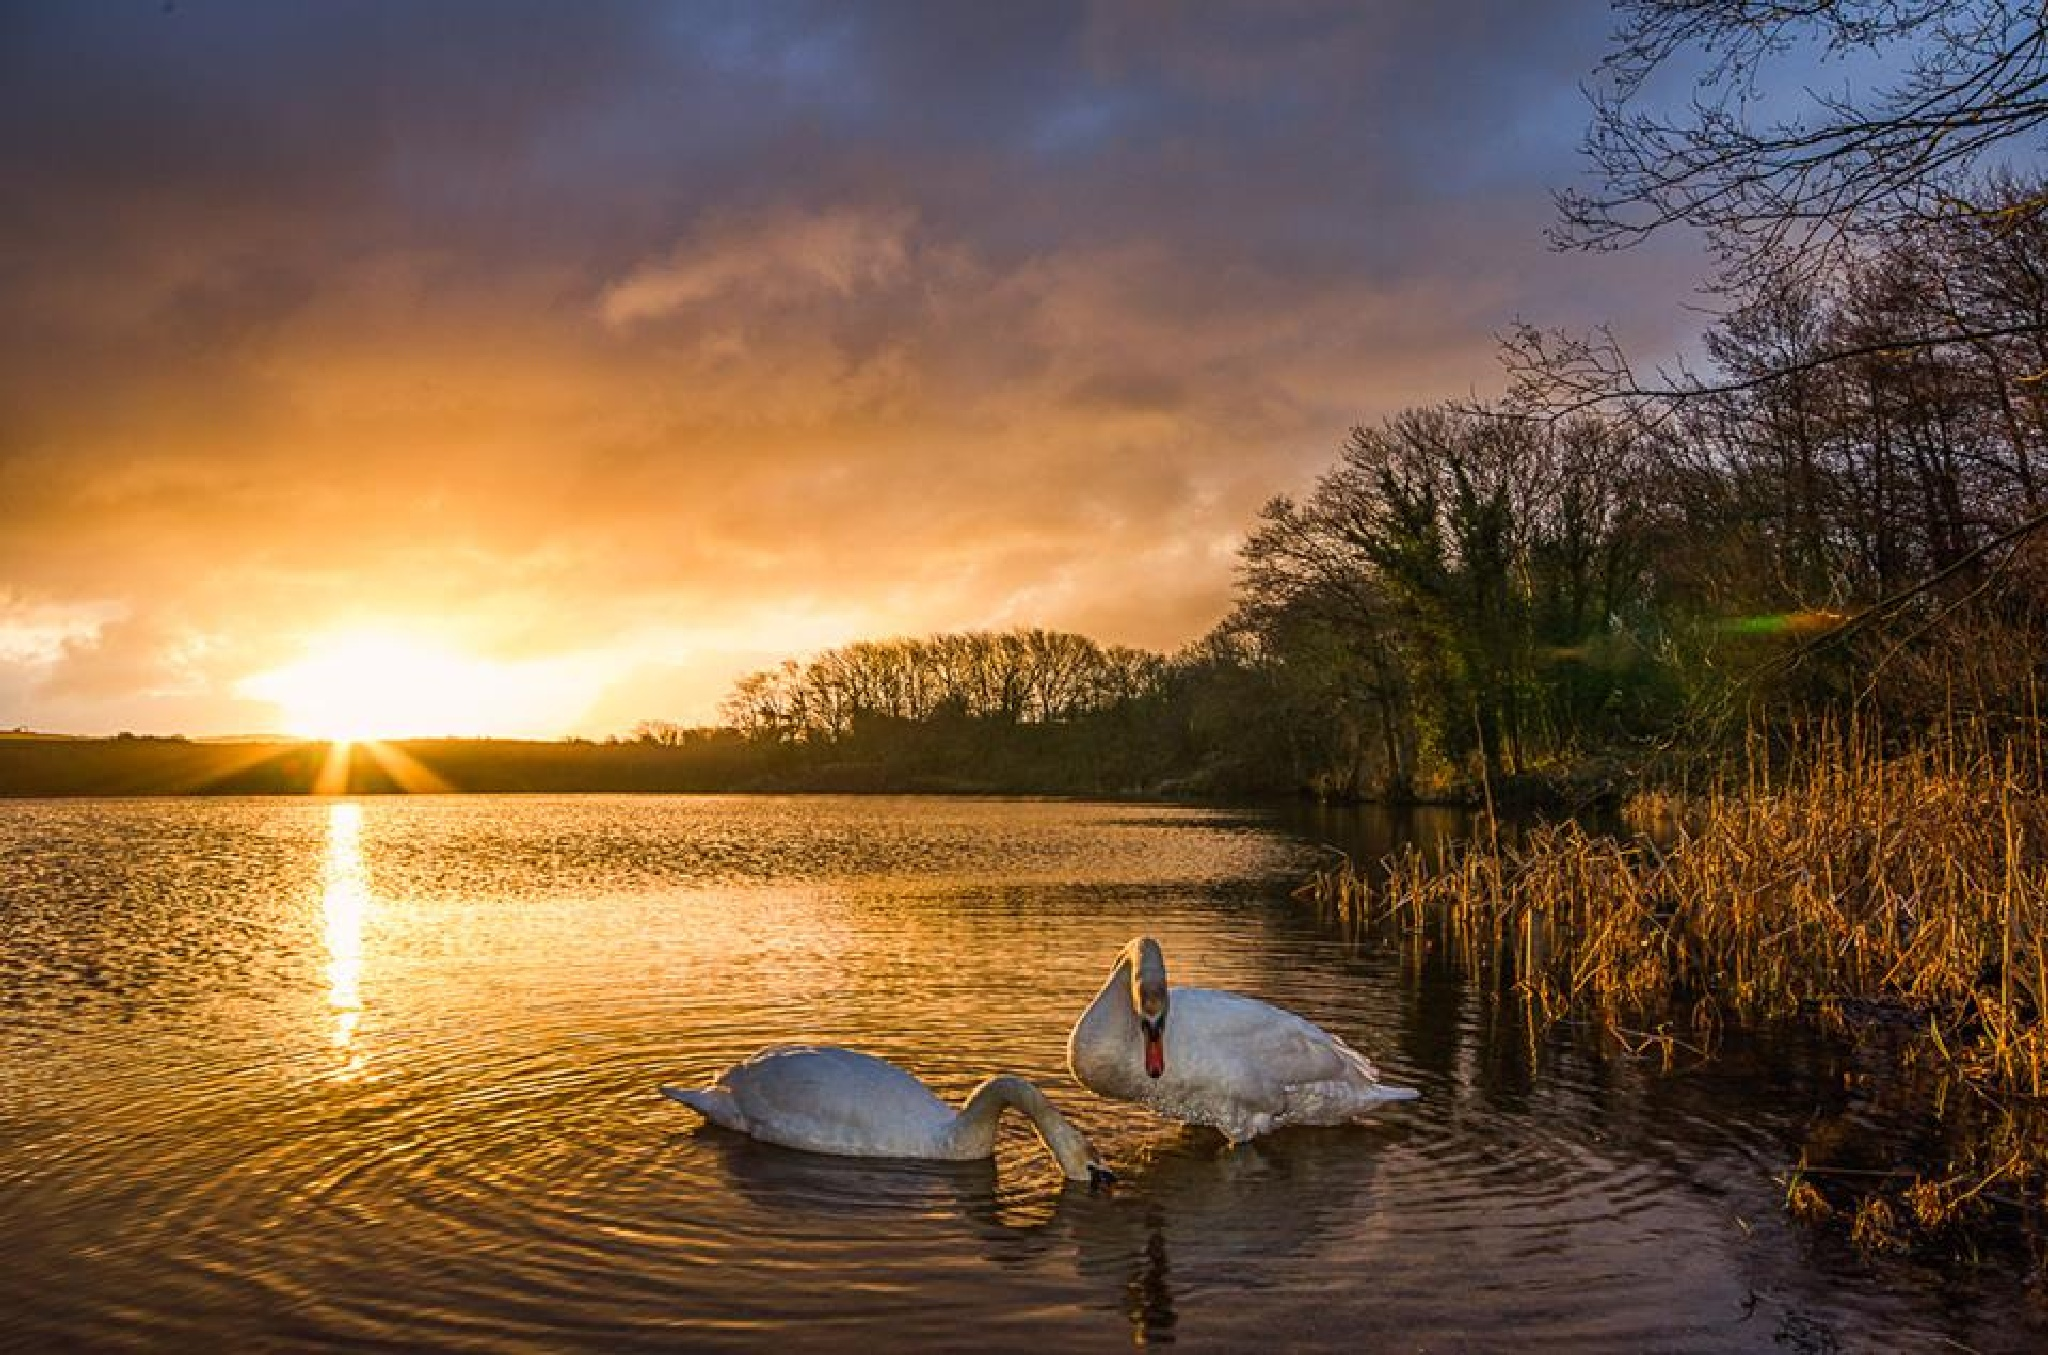 swan lake by stephen.roberts.31586